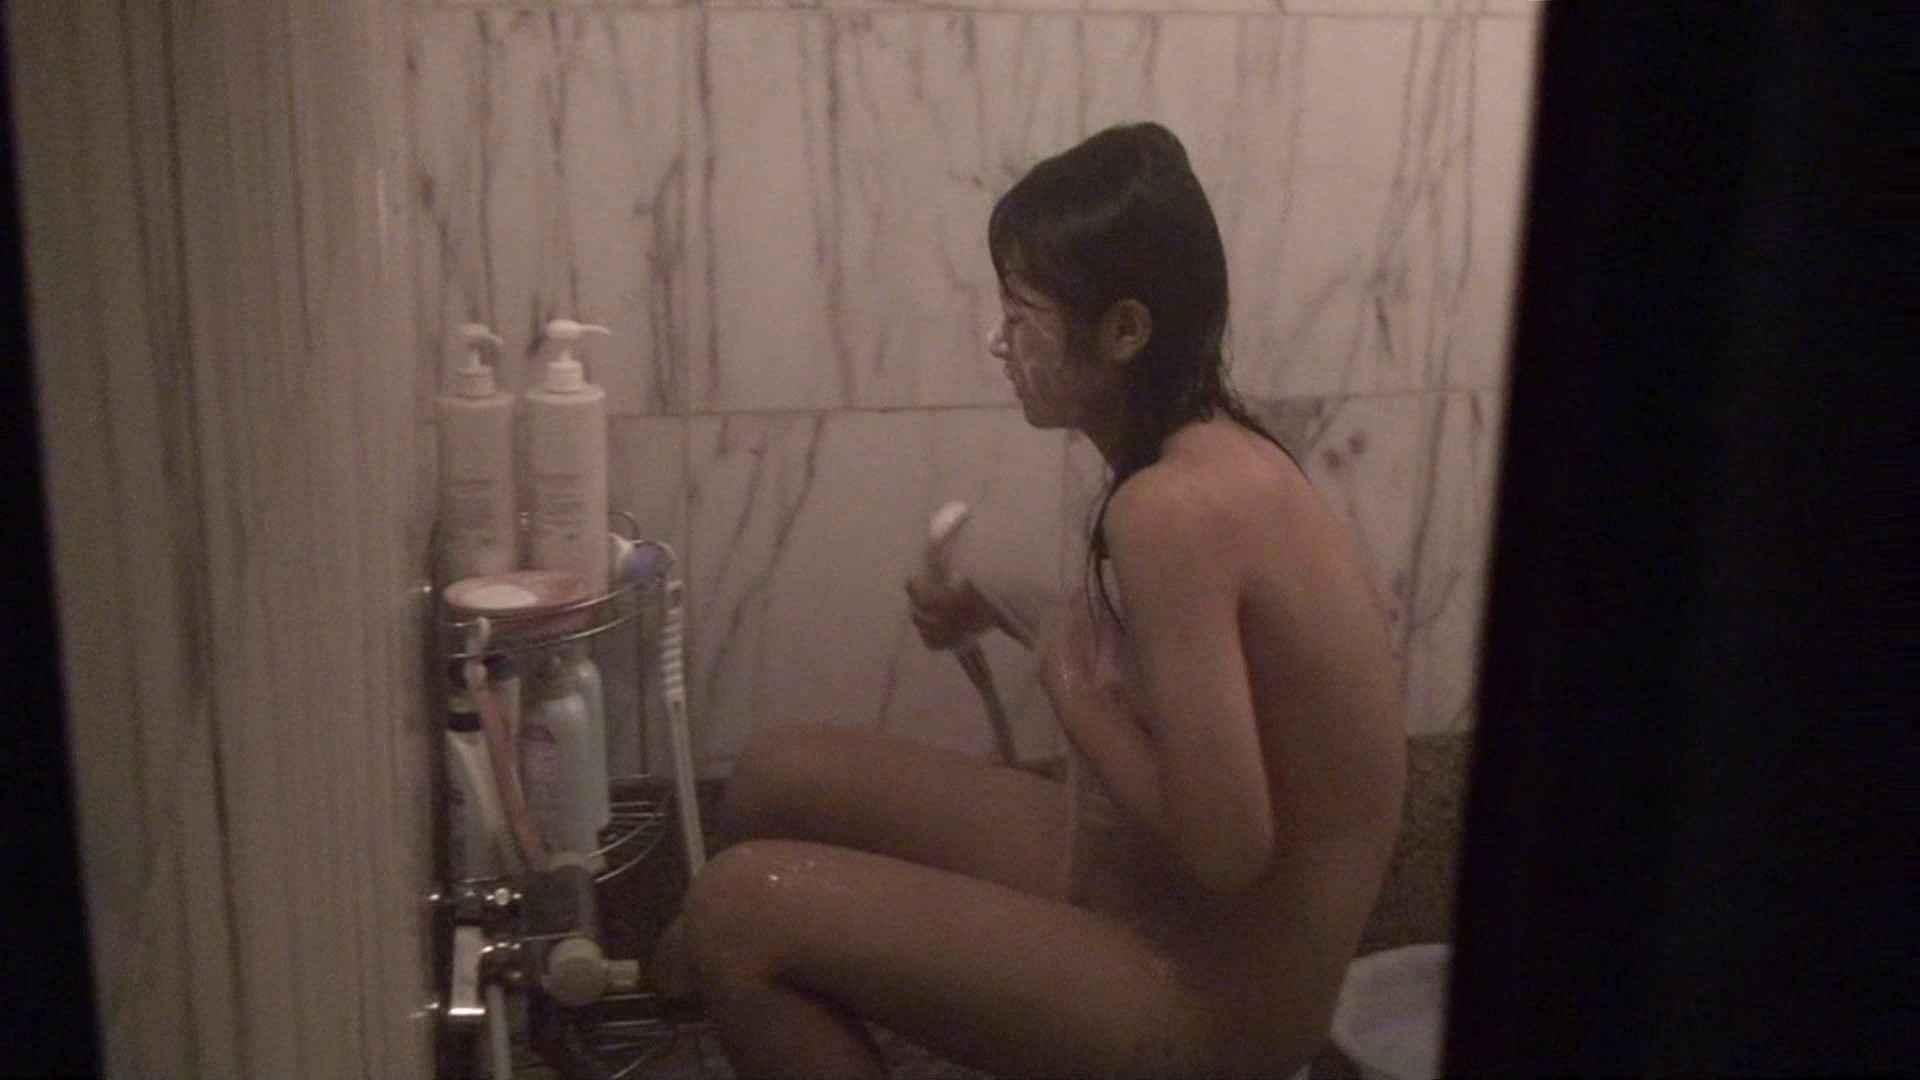 vol.03歌いながらつるつるのおっぱいを洗い流す彼女!近すぎてバレちゃた!? 美人編 AV無料 72画像 5